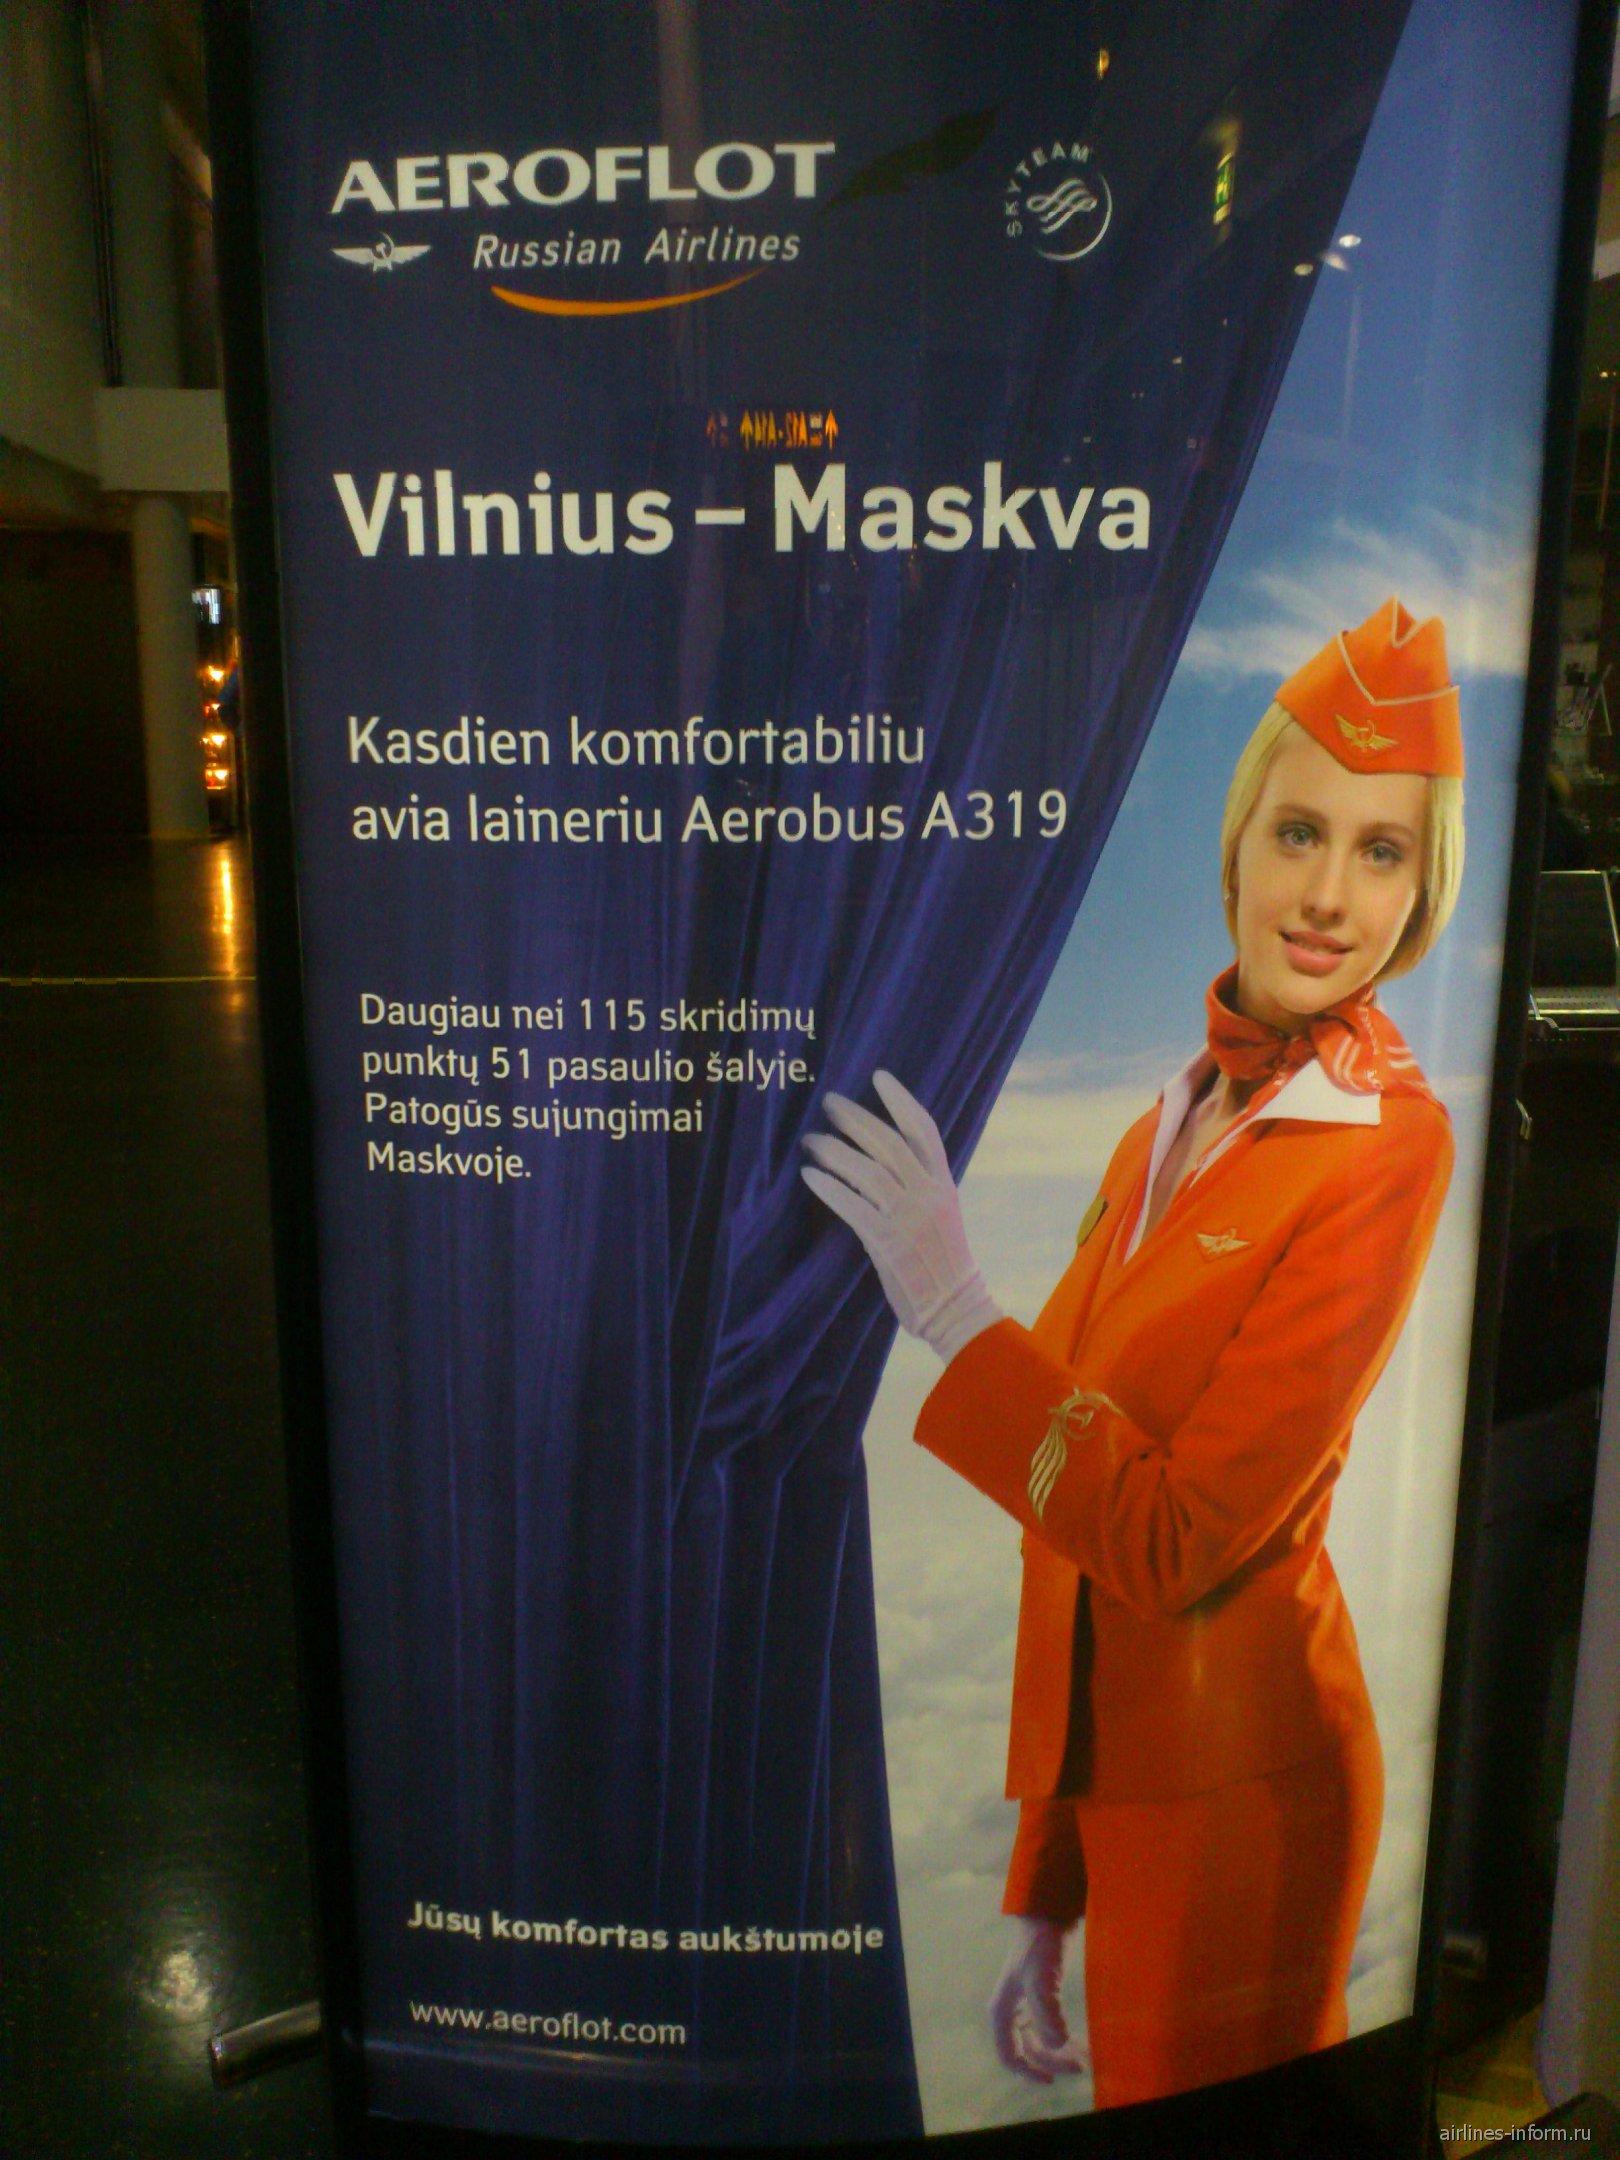 Реклама рейса Аэрофлота Вильнюс-Москва